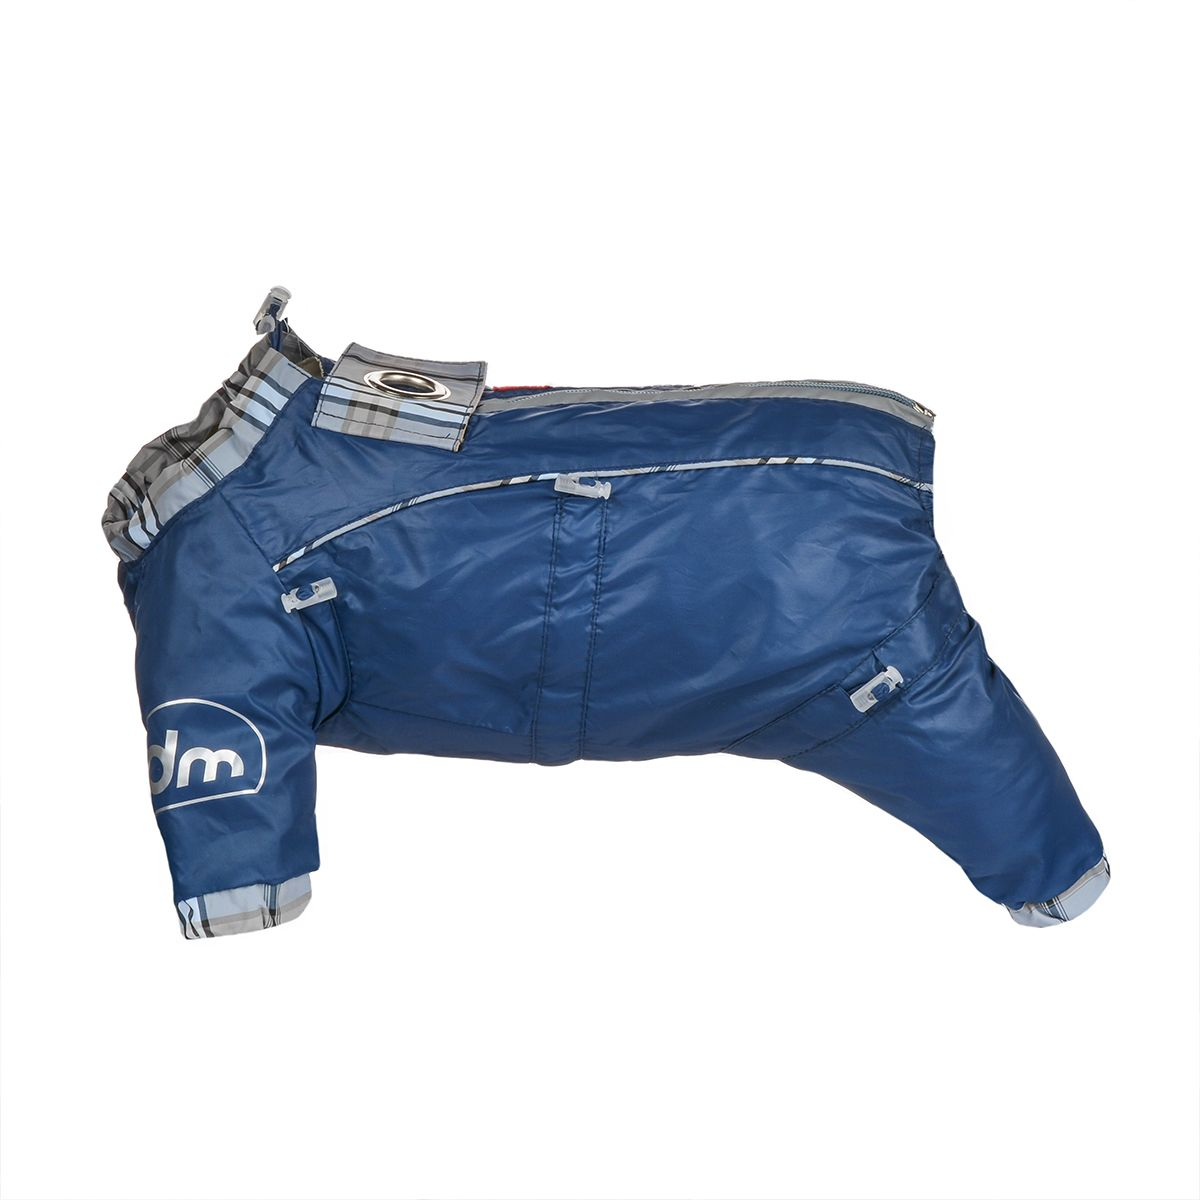 Комбинезон для собак Dogmoda  Doggs , для мальчика, цвет: темно-синий. Размер XXXL